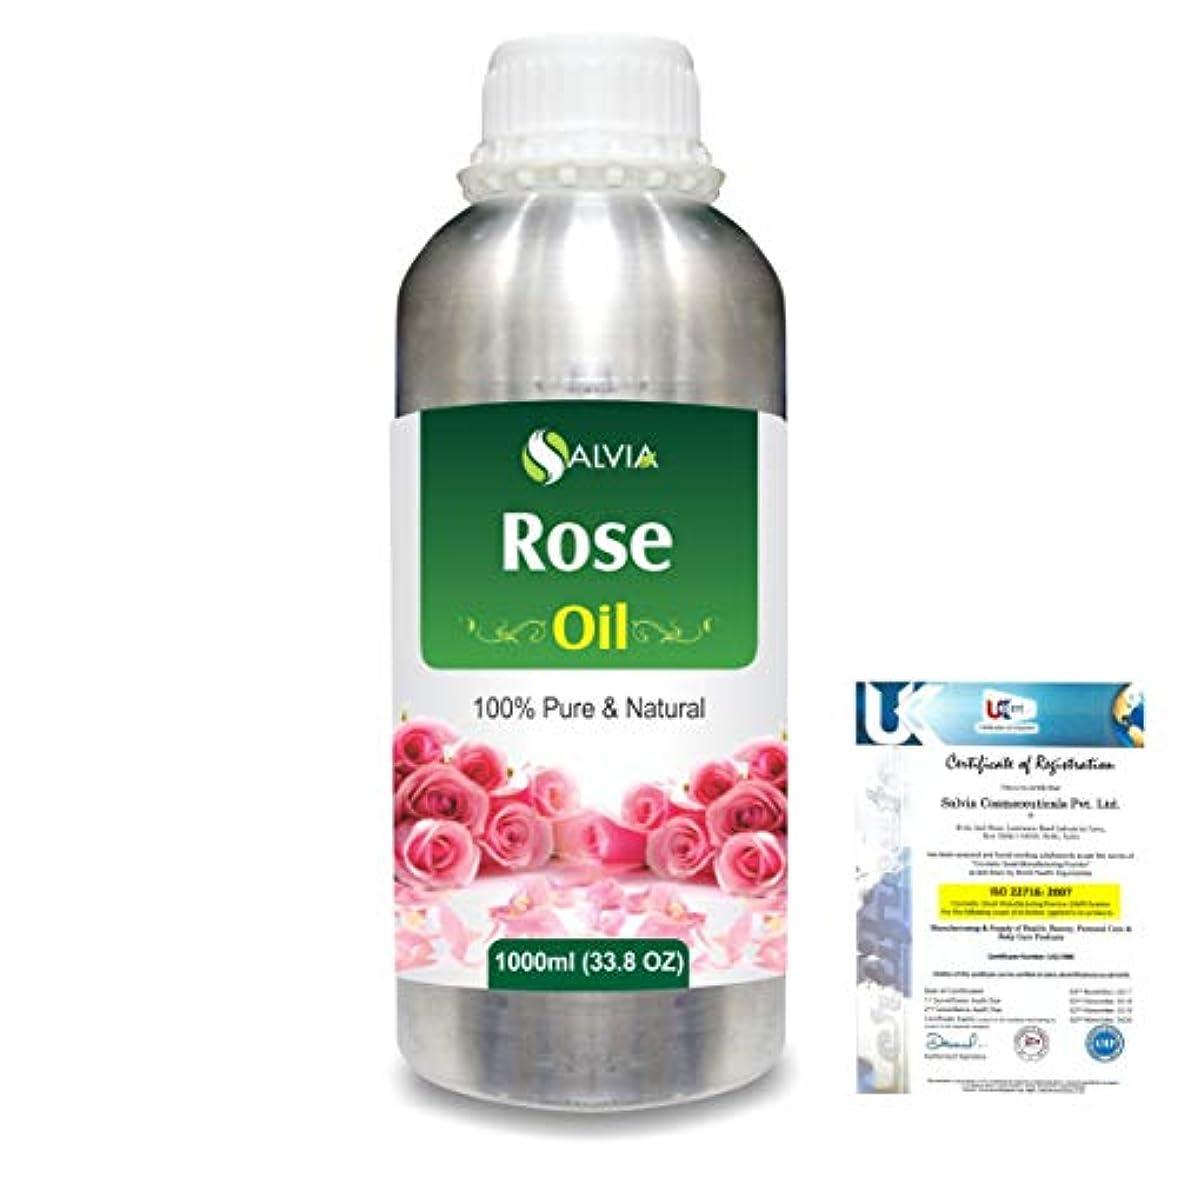 Rose (Rosa Damacenia) 100% Natural Pure Essential Oil 1000ml/33.8fl.oz.